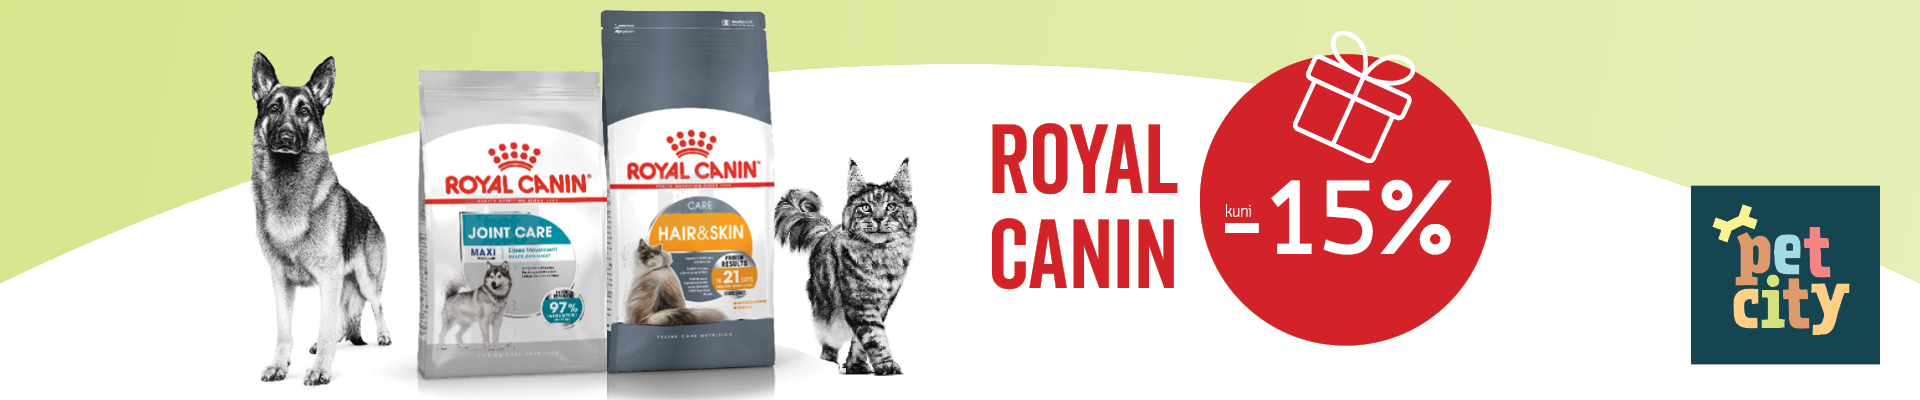 Kuivtoit kassile kuni -15%